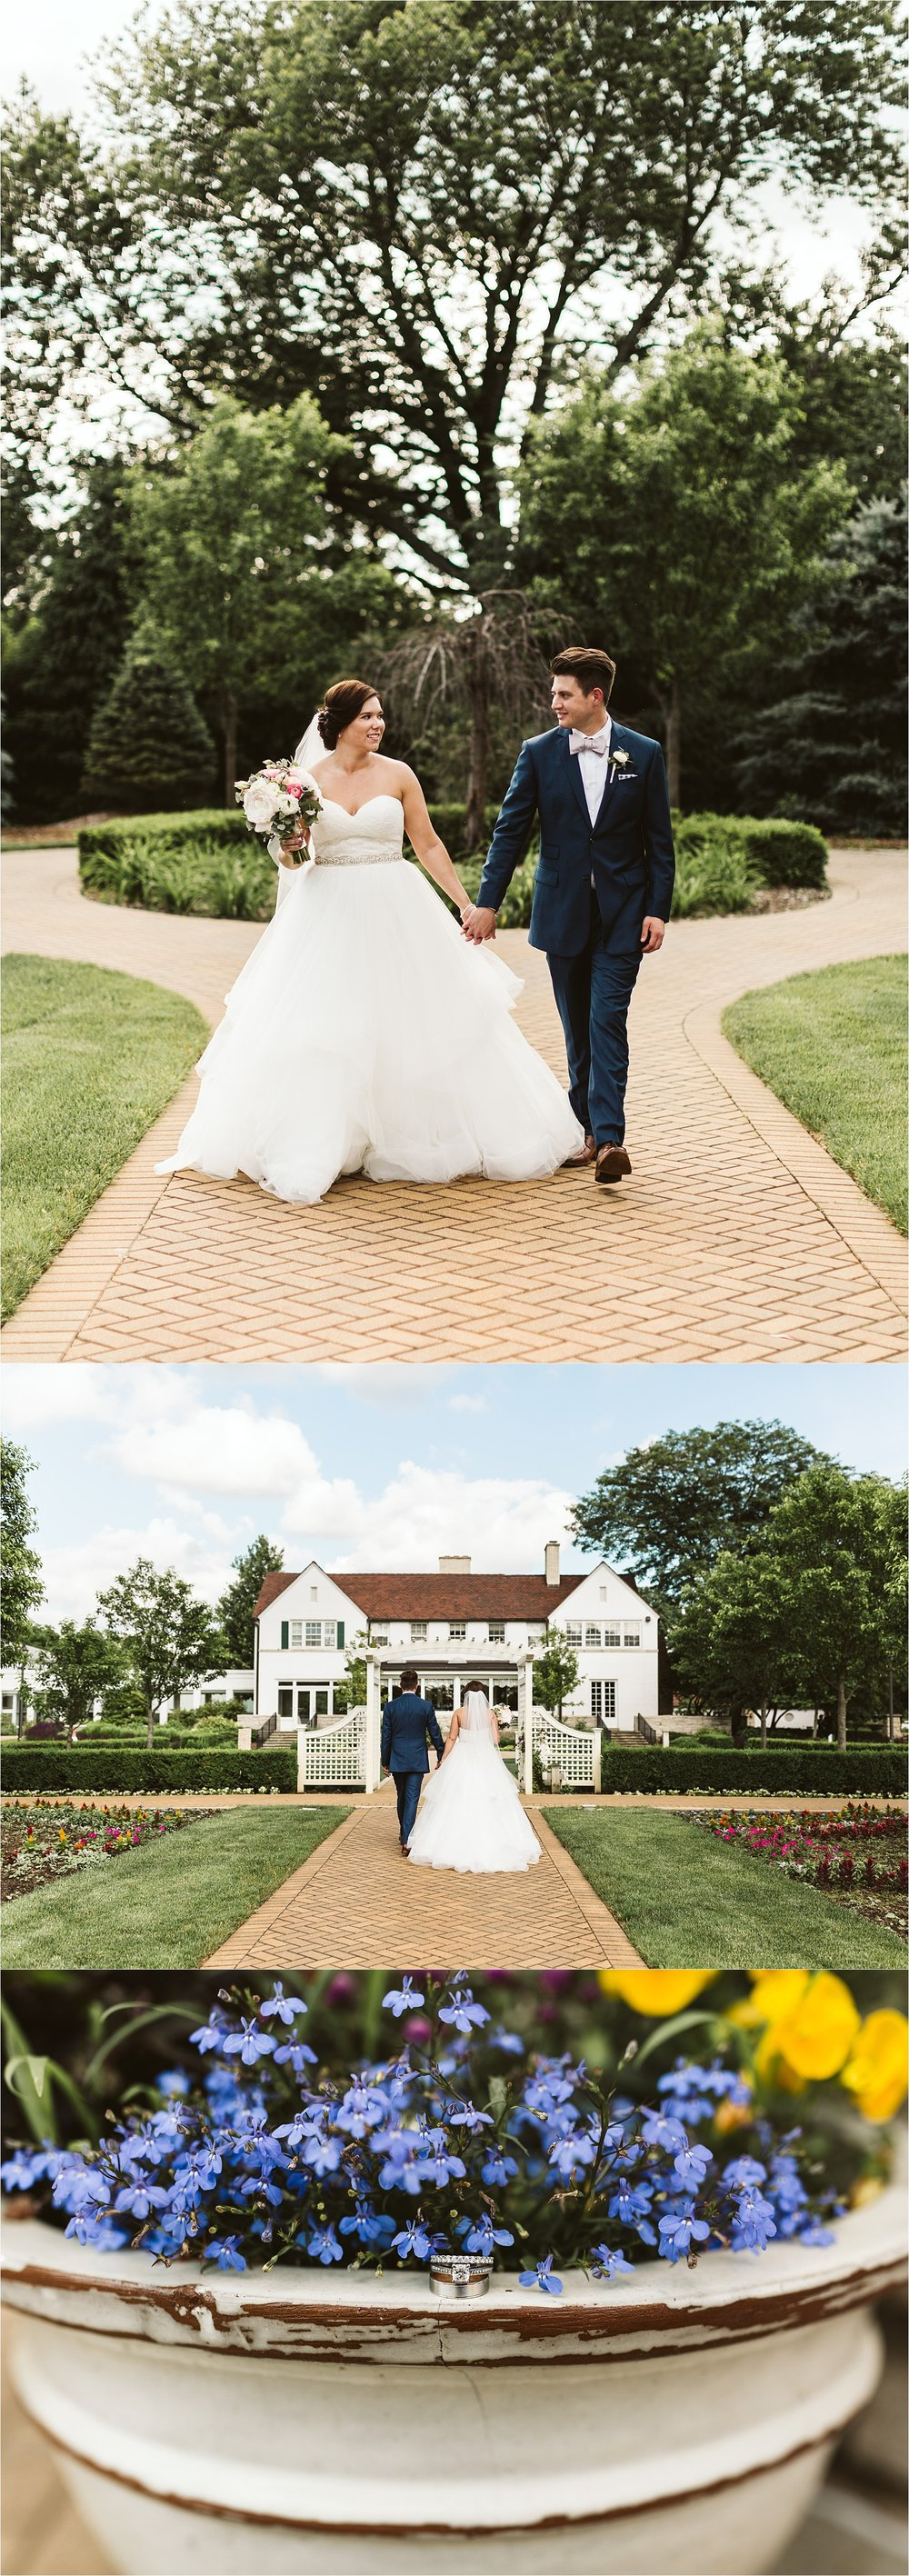 Danada House Wheaton Wedding_0084.jpg